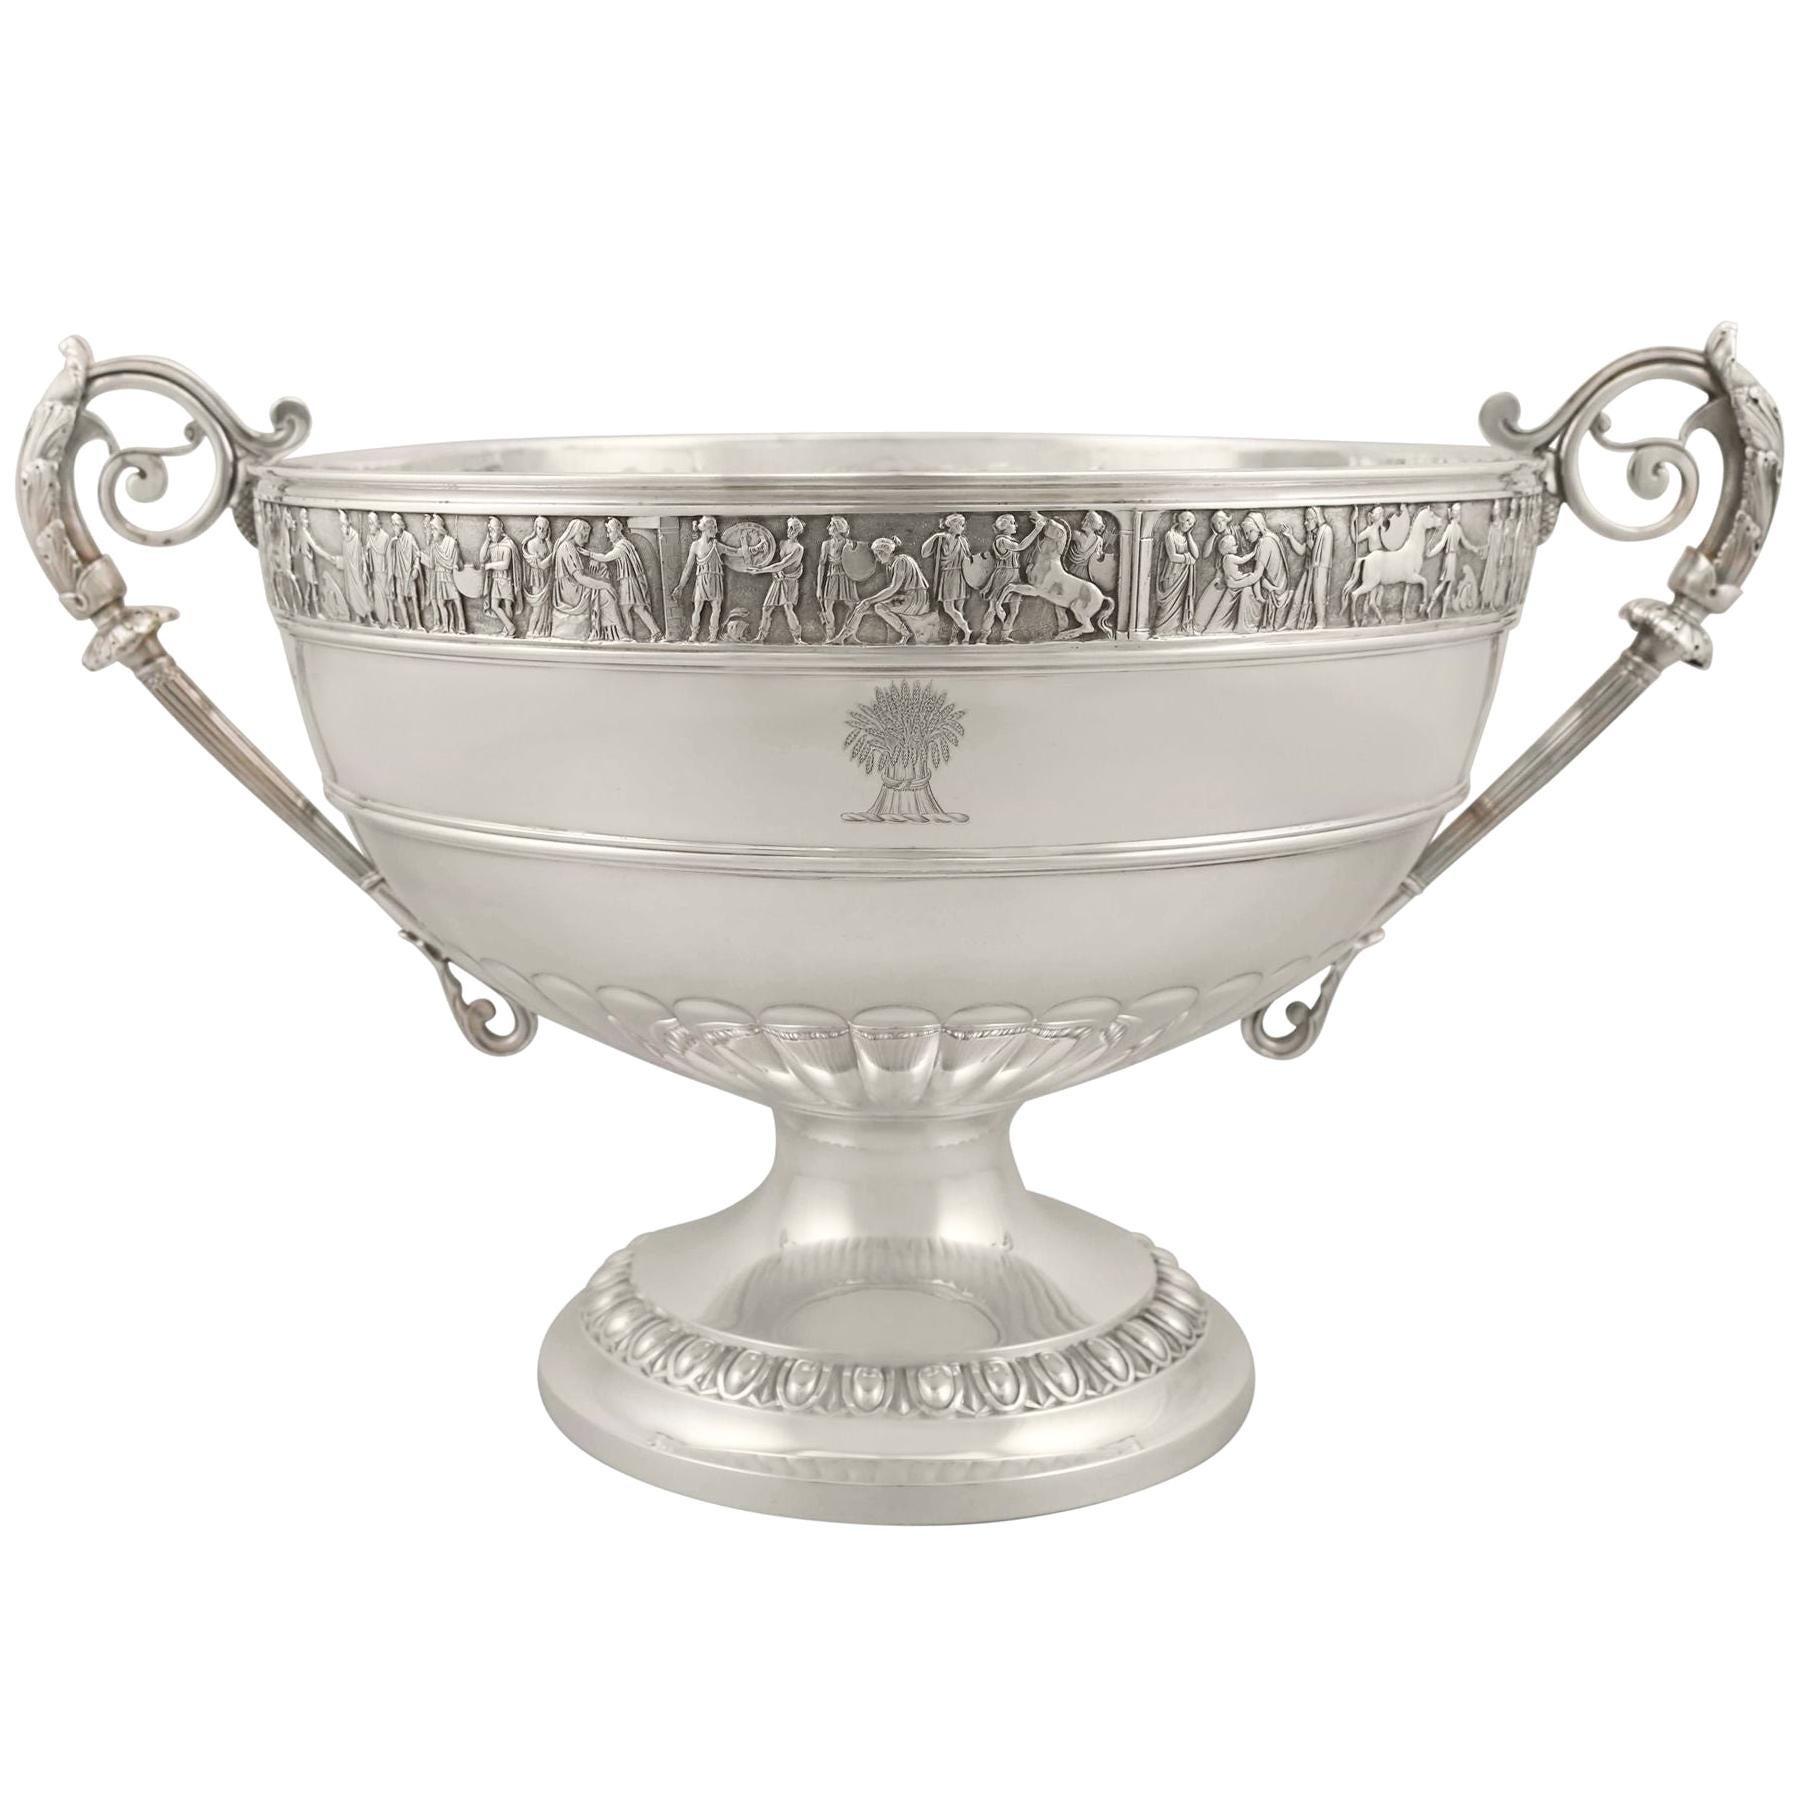 Antique Victorian Sterling Silver Presentation Bowl, 1899